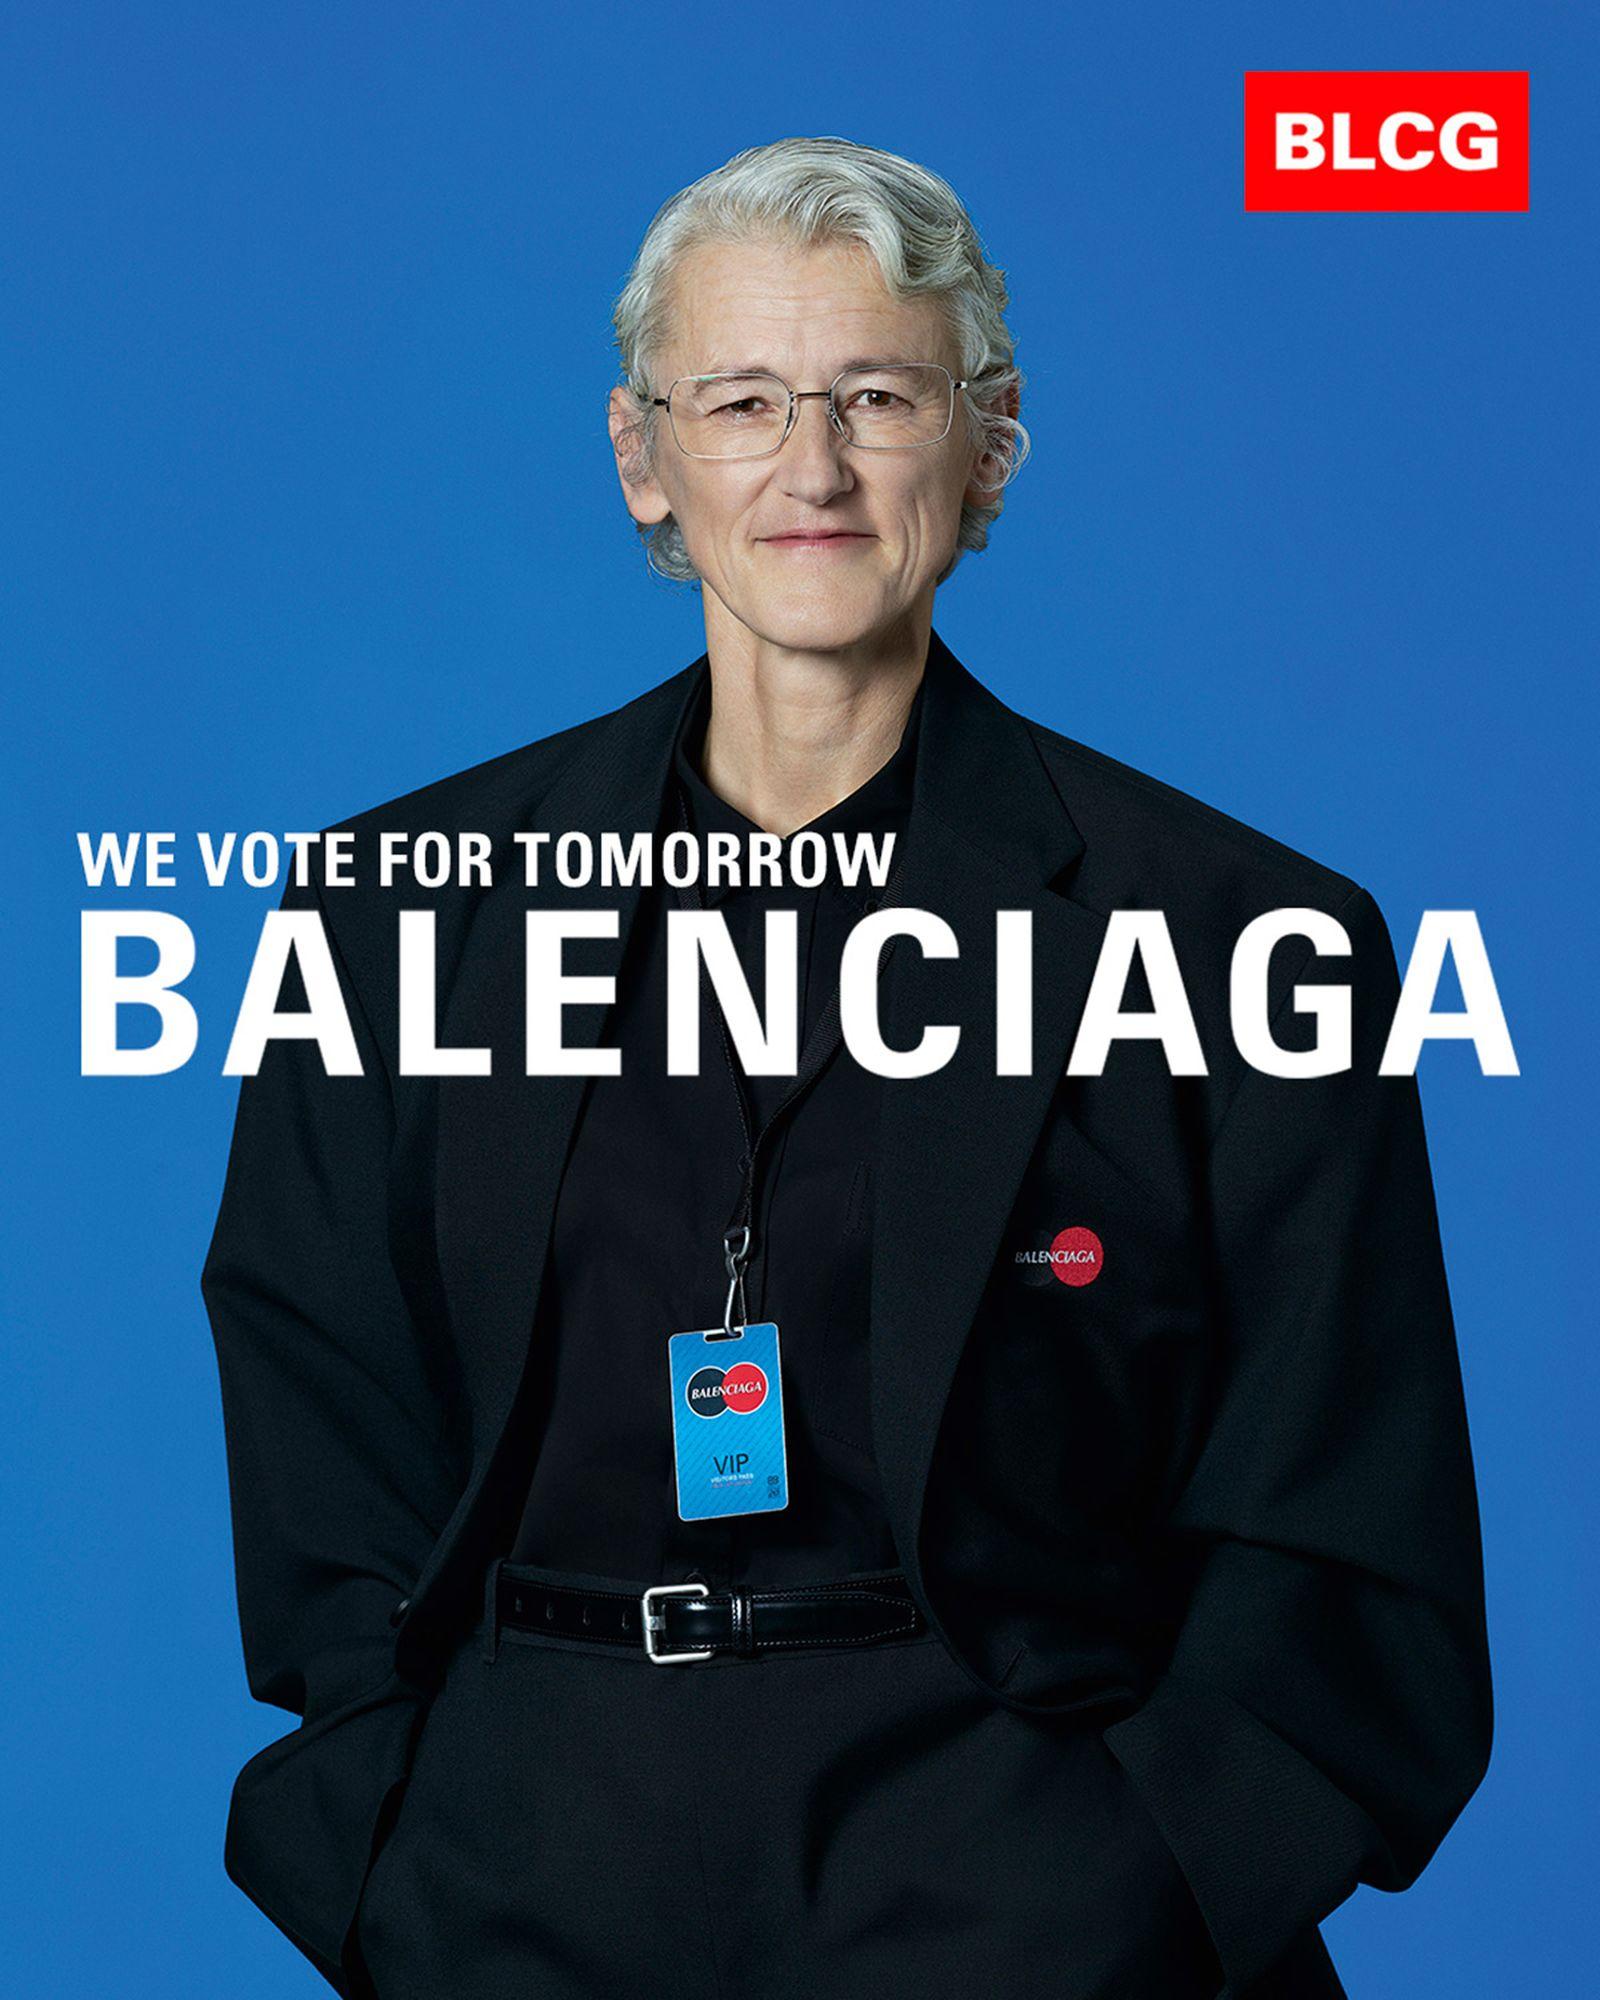 baleciaga-politics-main01